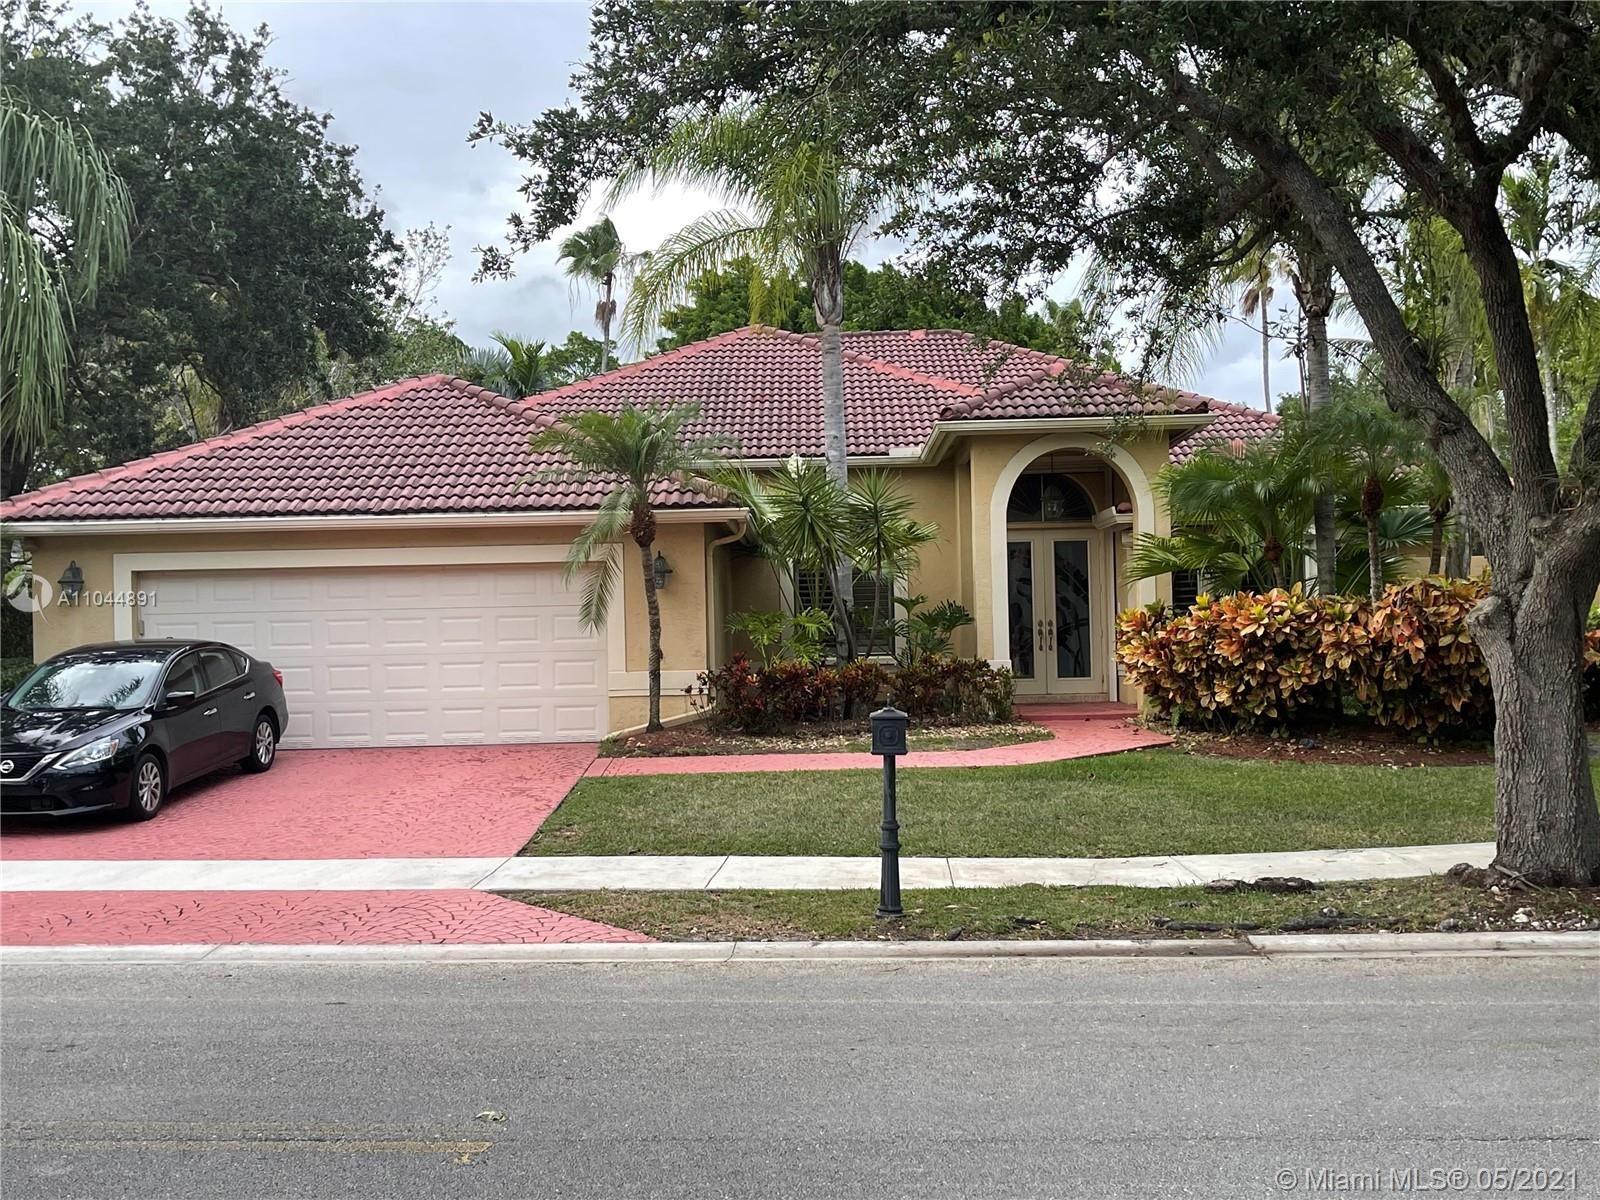 3240 Huntington, Weston, FL 33332 - #: A11044891